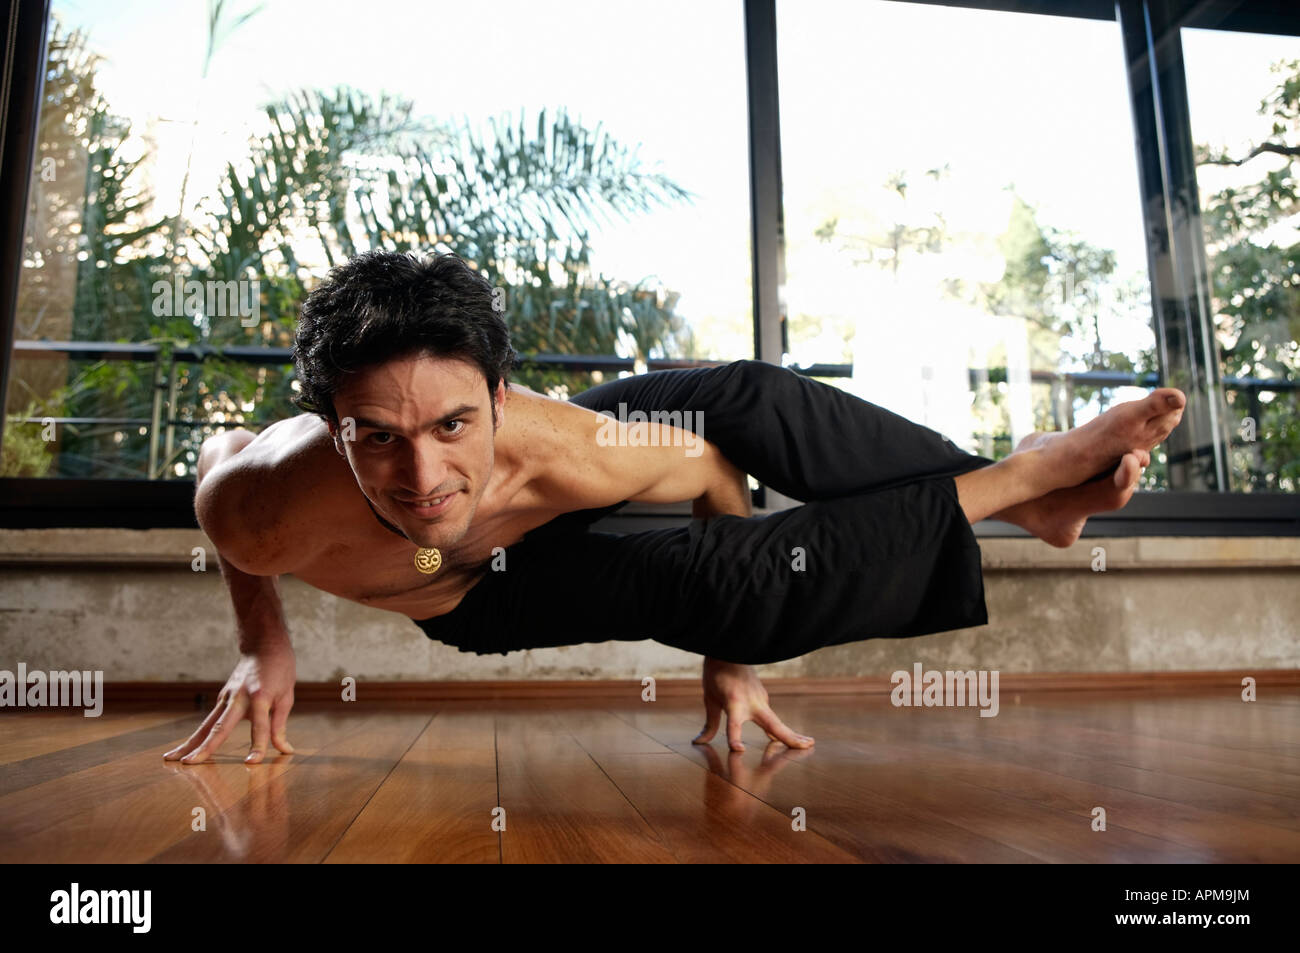 Man practicing yoga - Stock Image